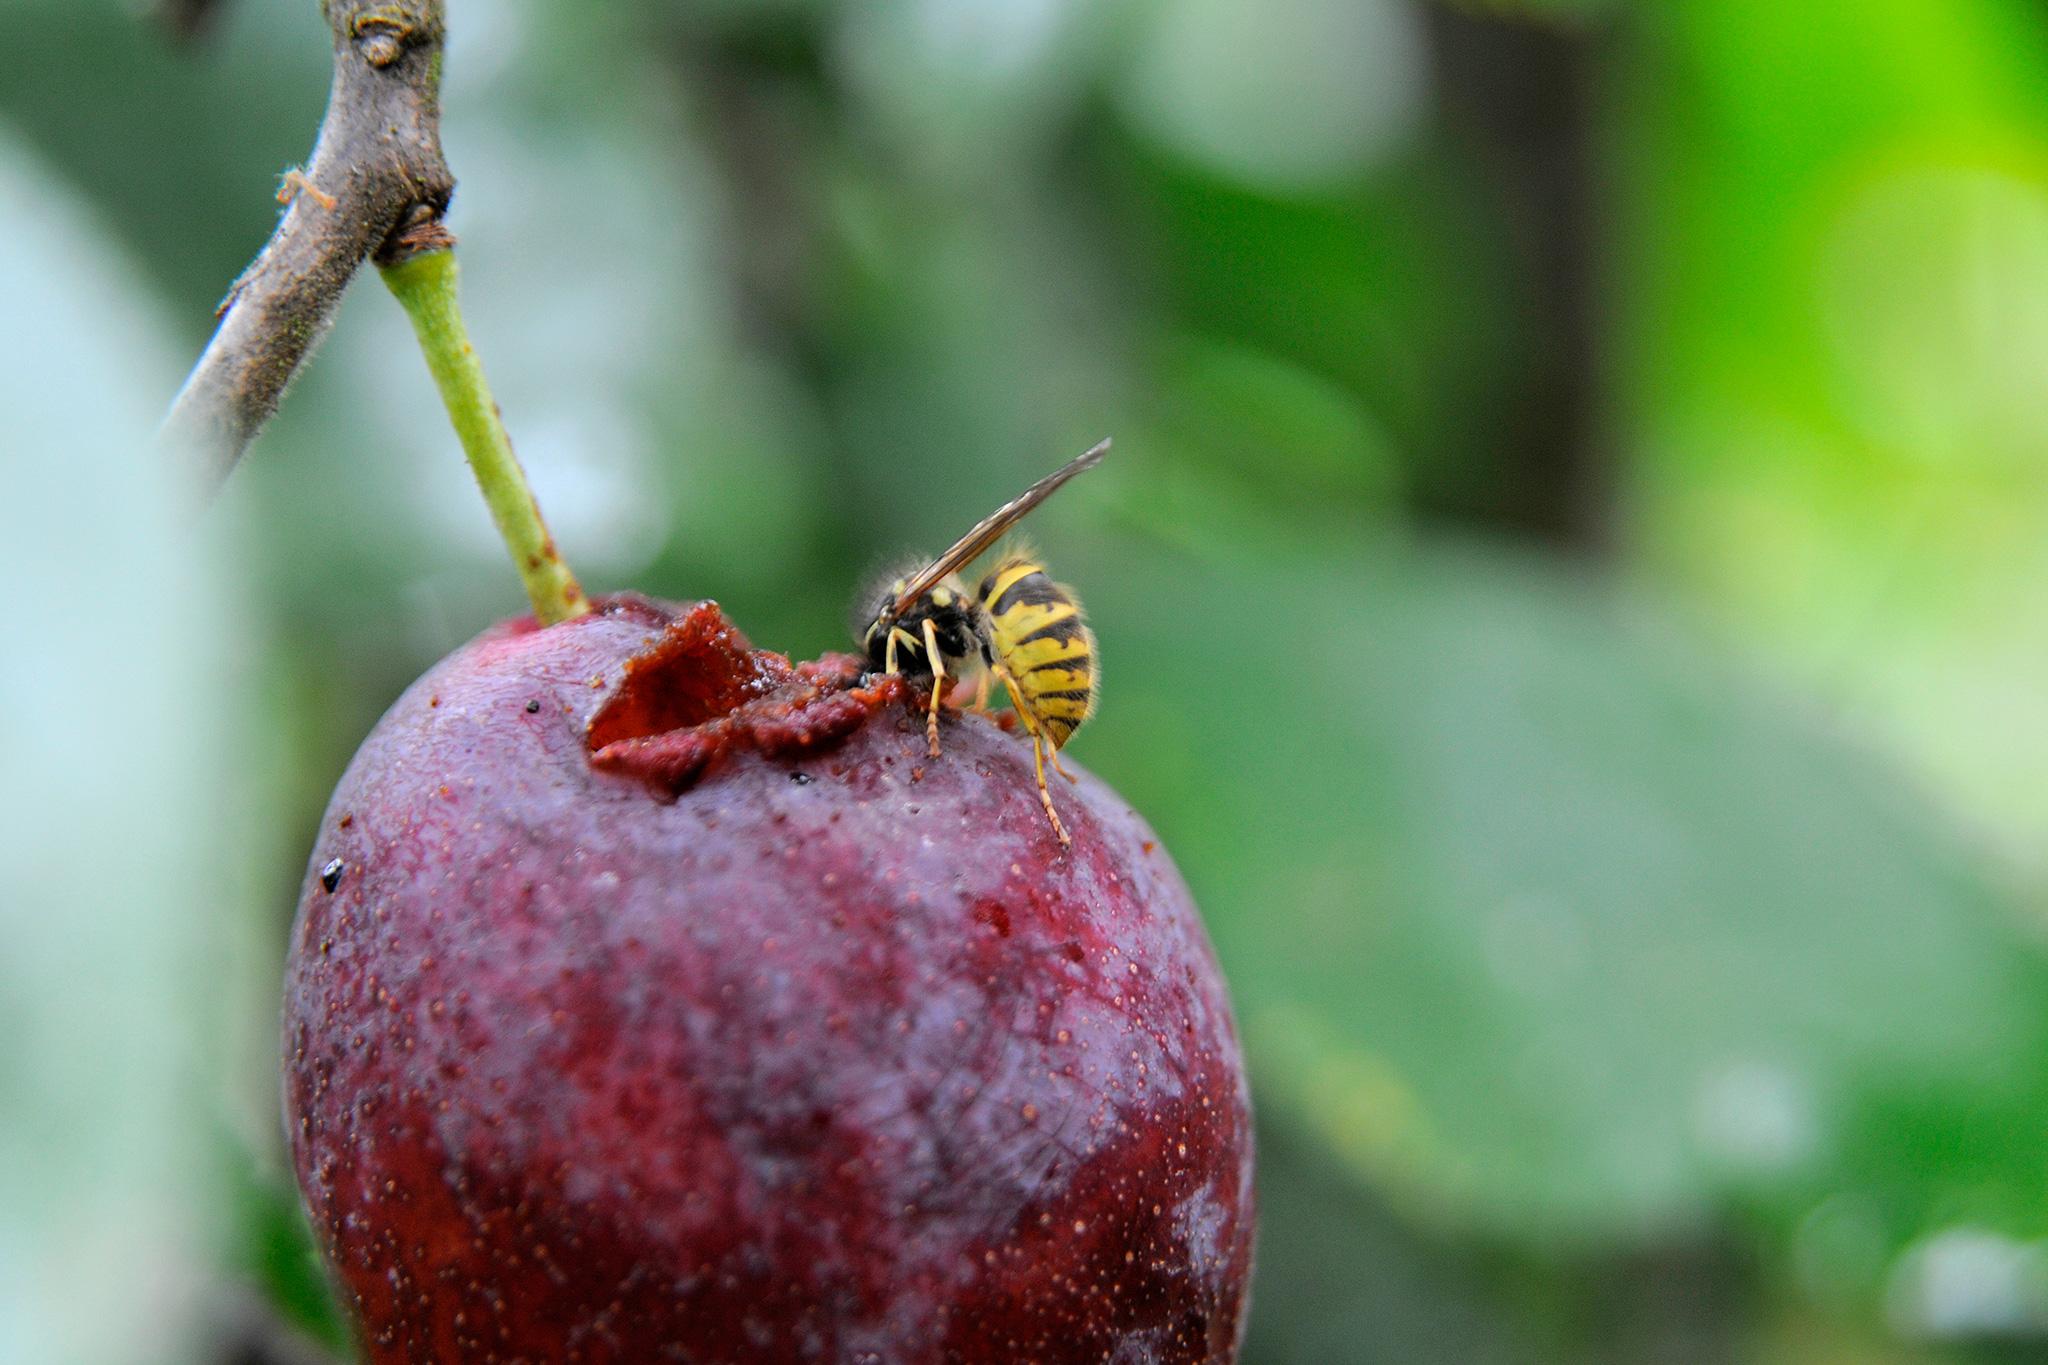 wasp-eating-plum-fruits-2